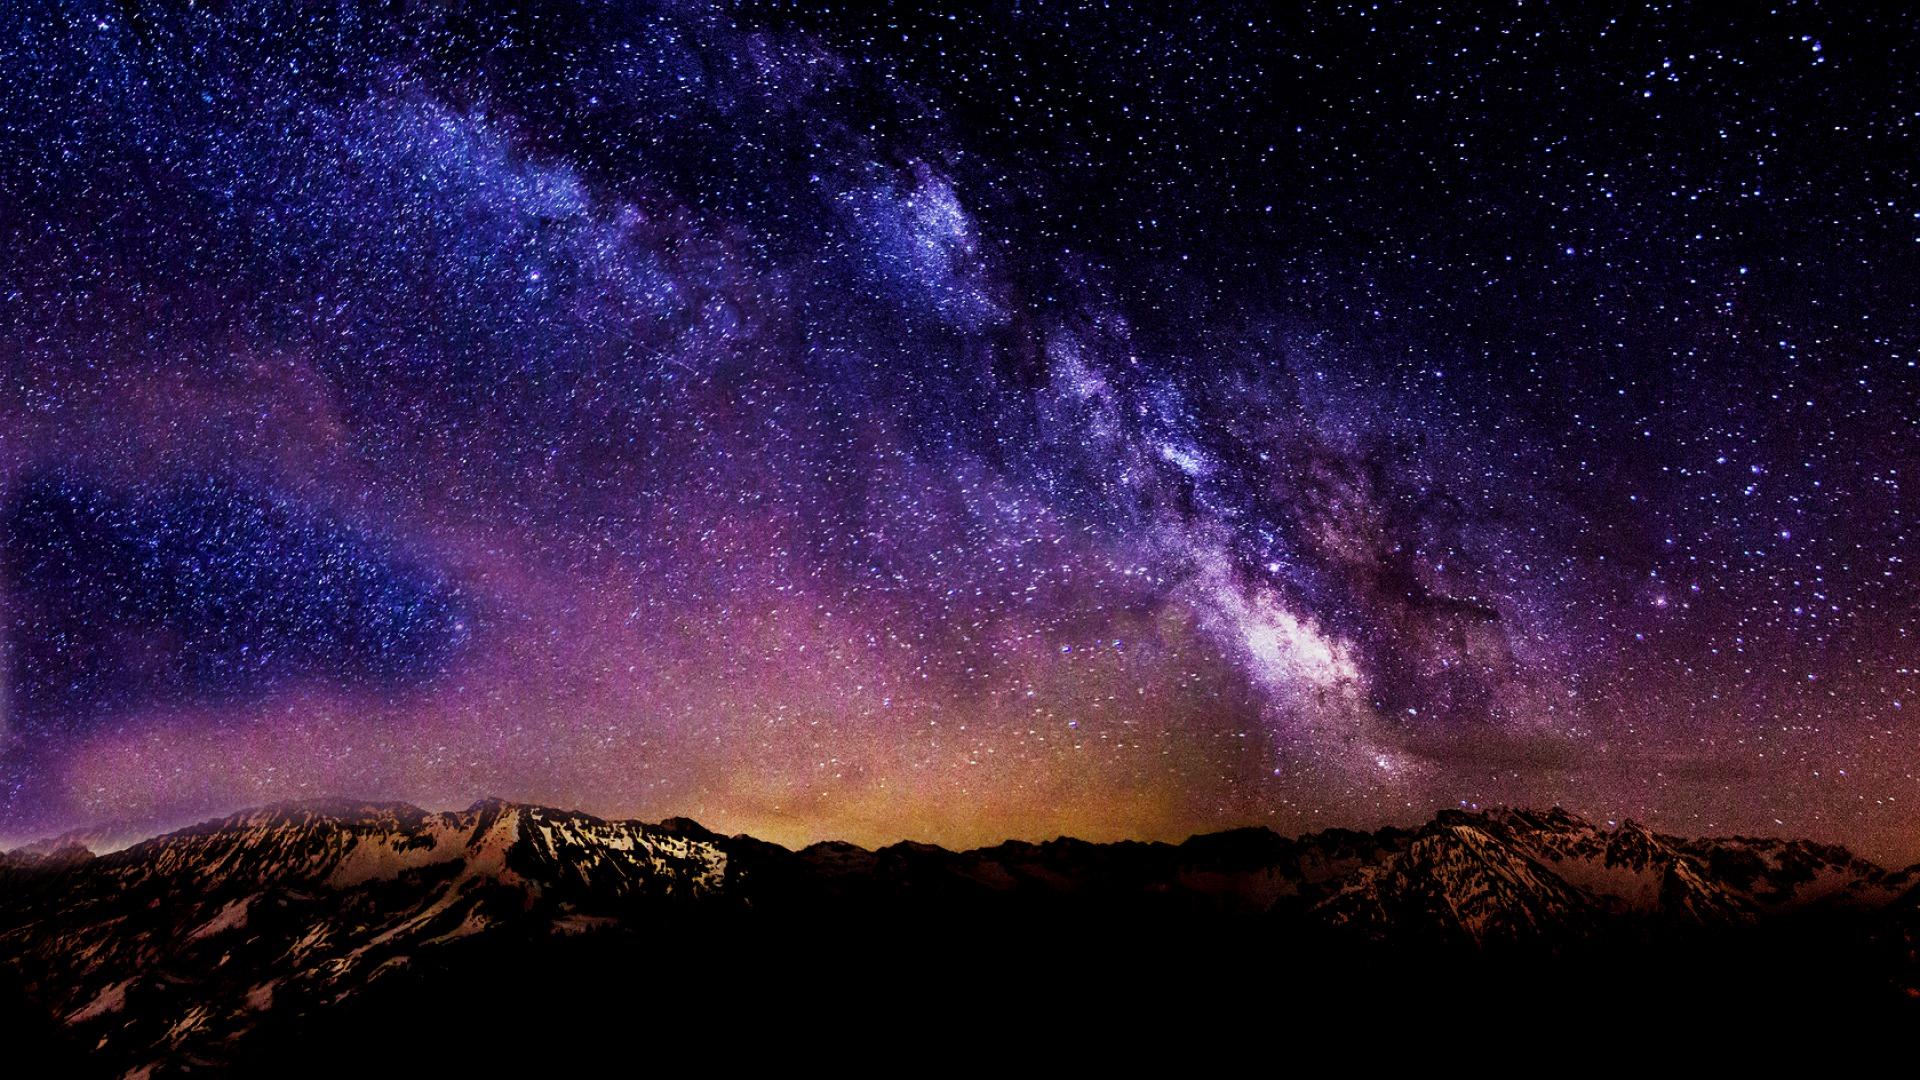 Starry Starry Night HD Desktop Background hiking2christ 1920x1080